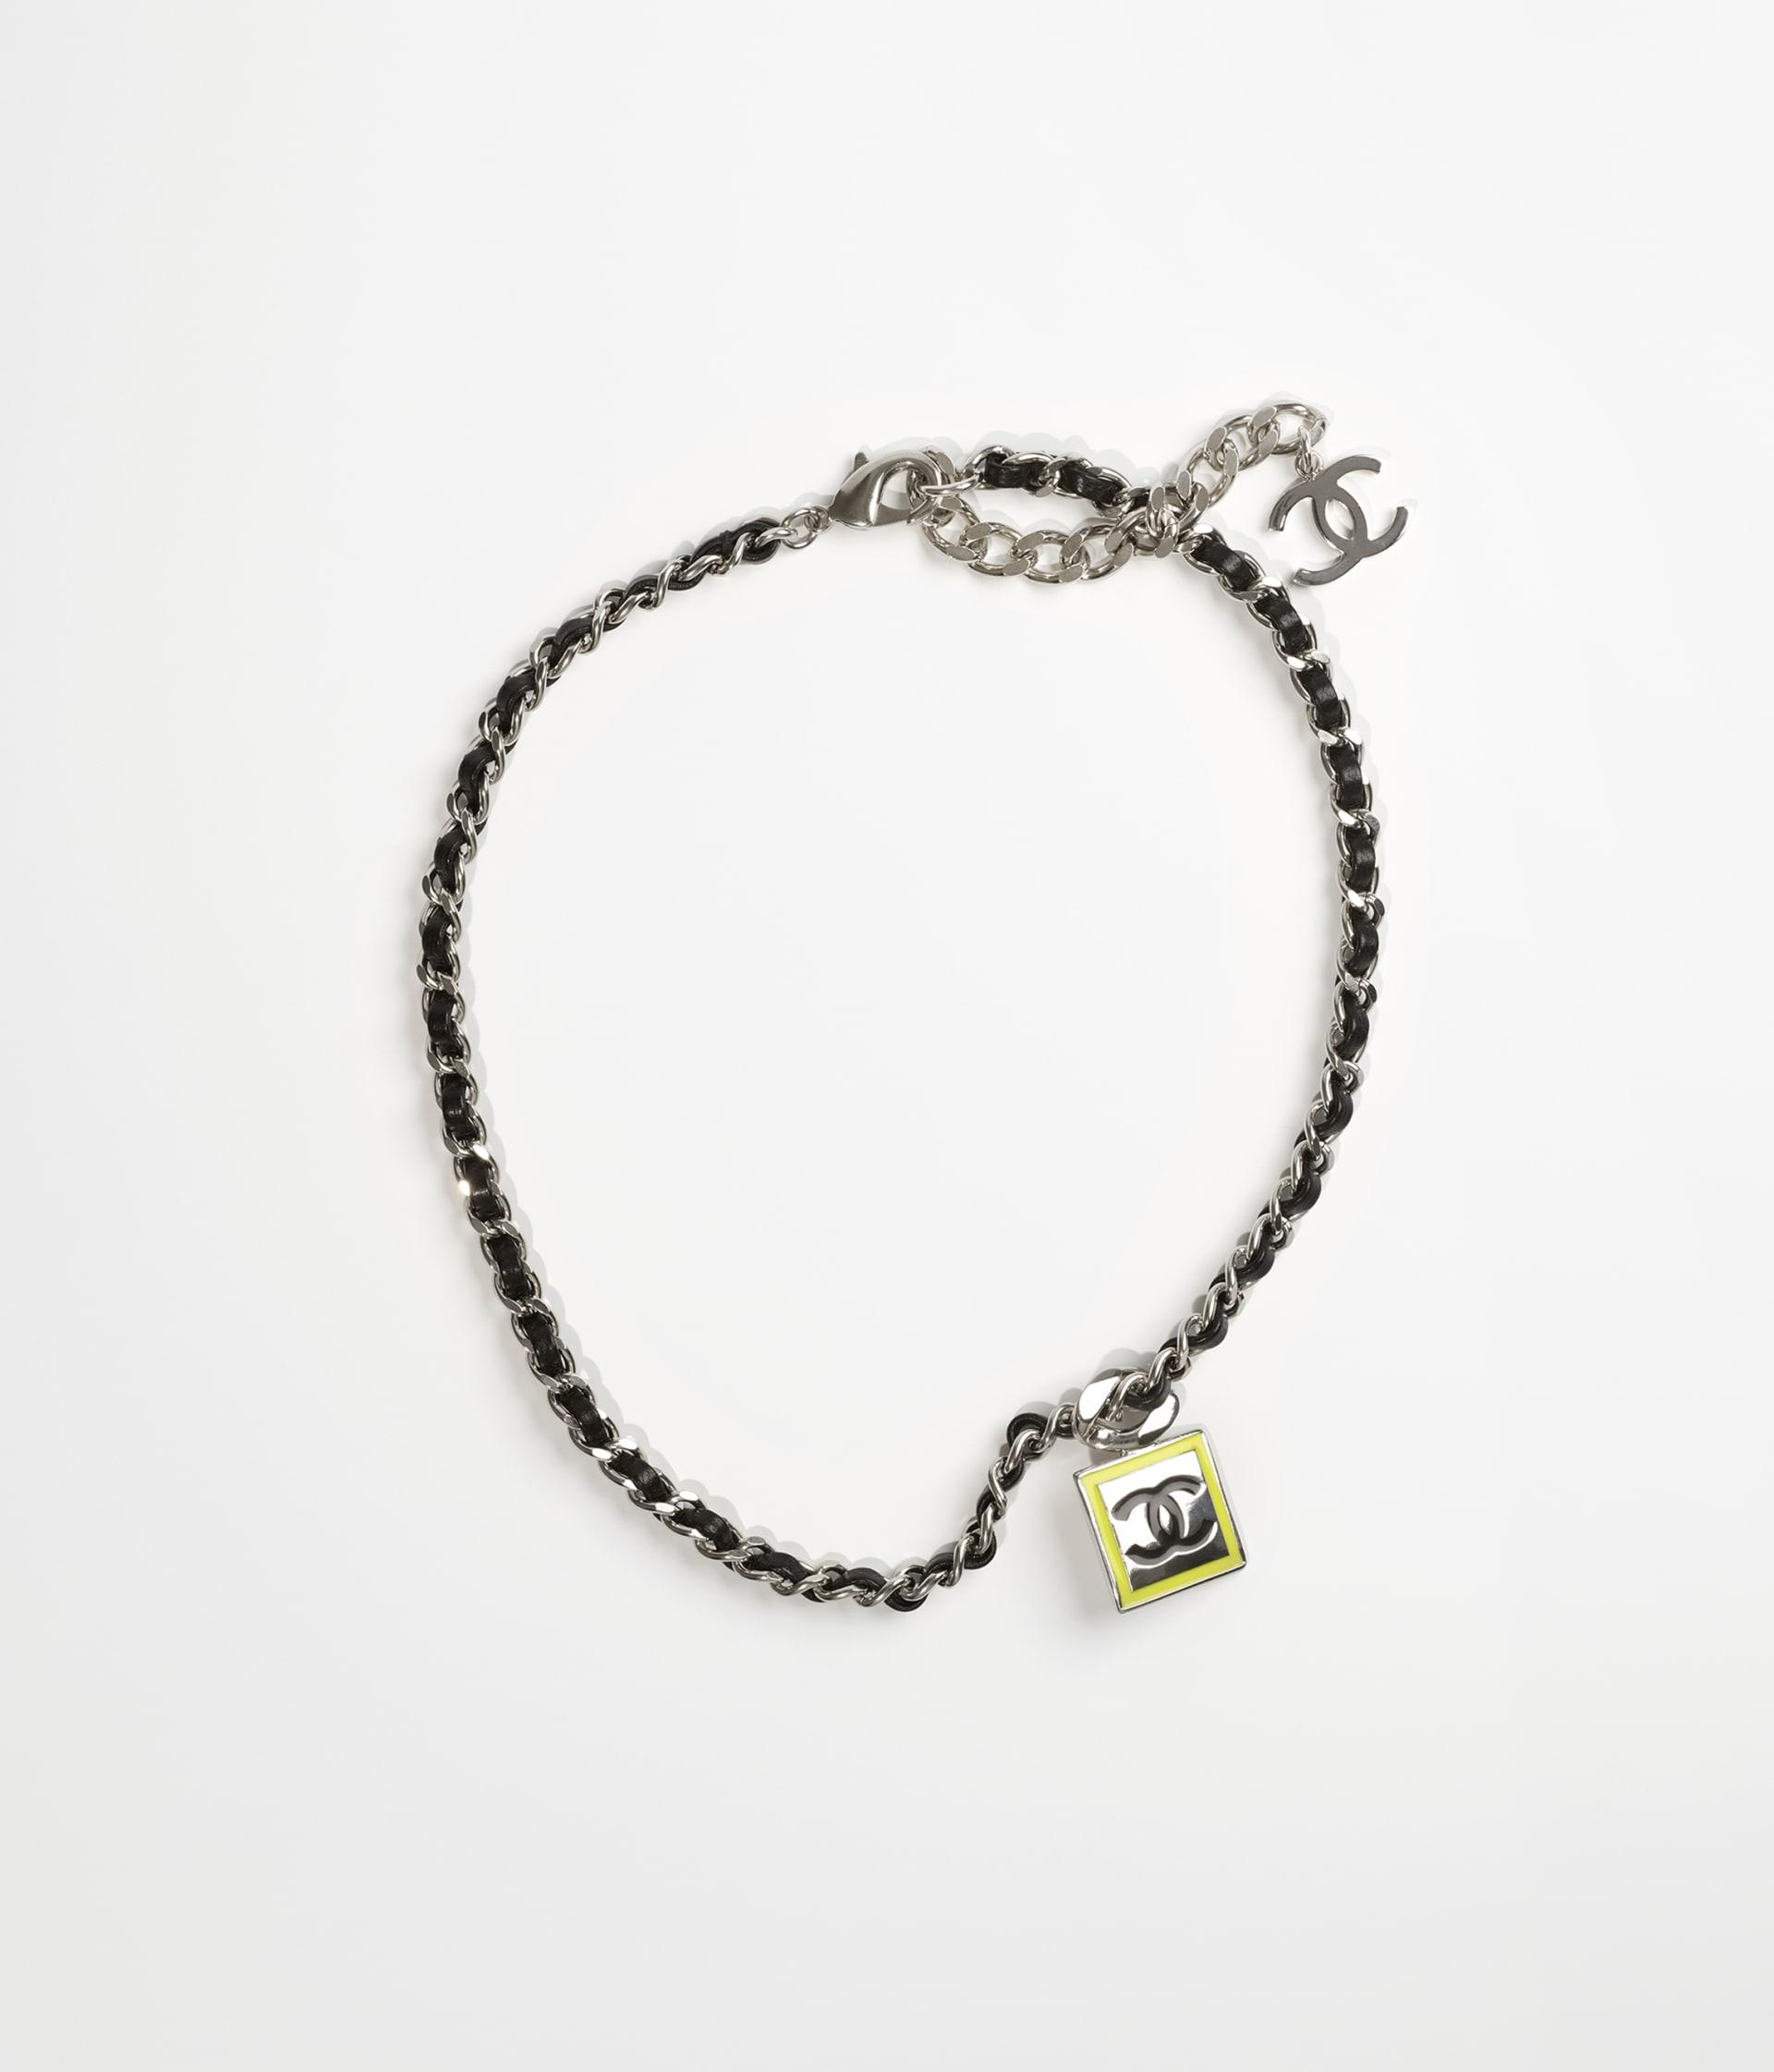 image 1 - Necklace - Metal & Lambskin - Silver, Neon Yellow & Black